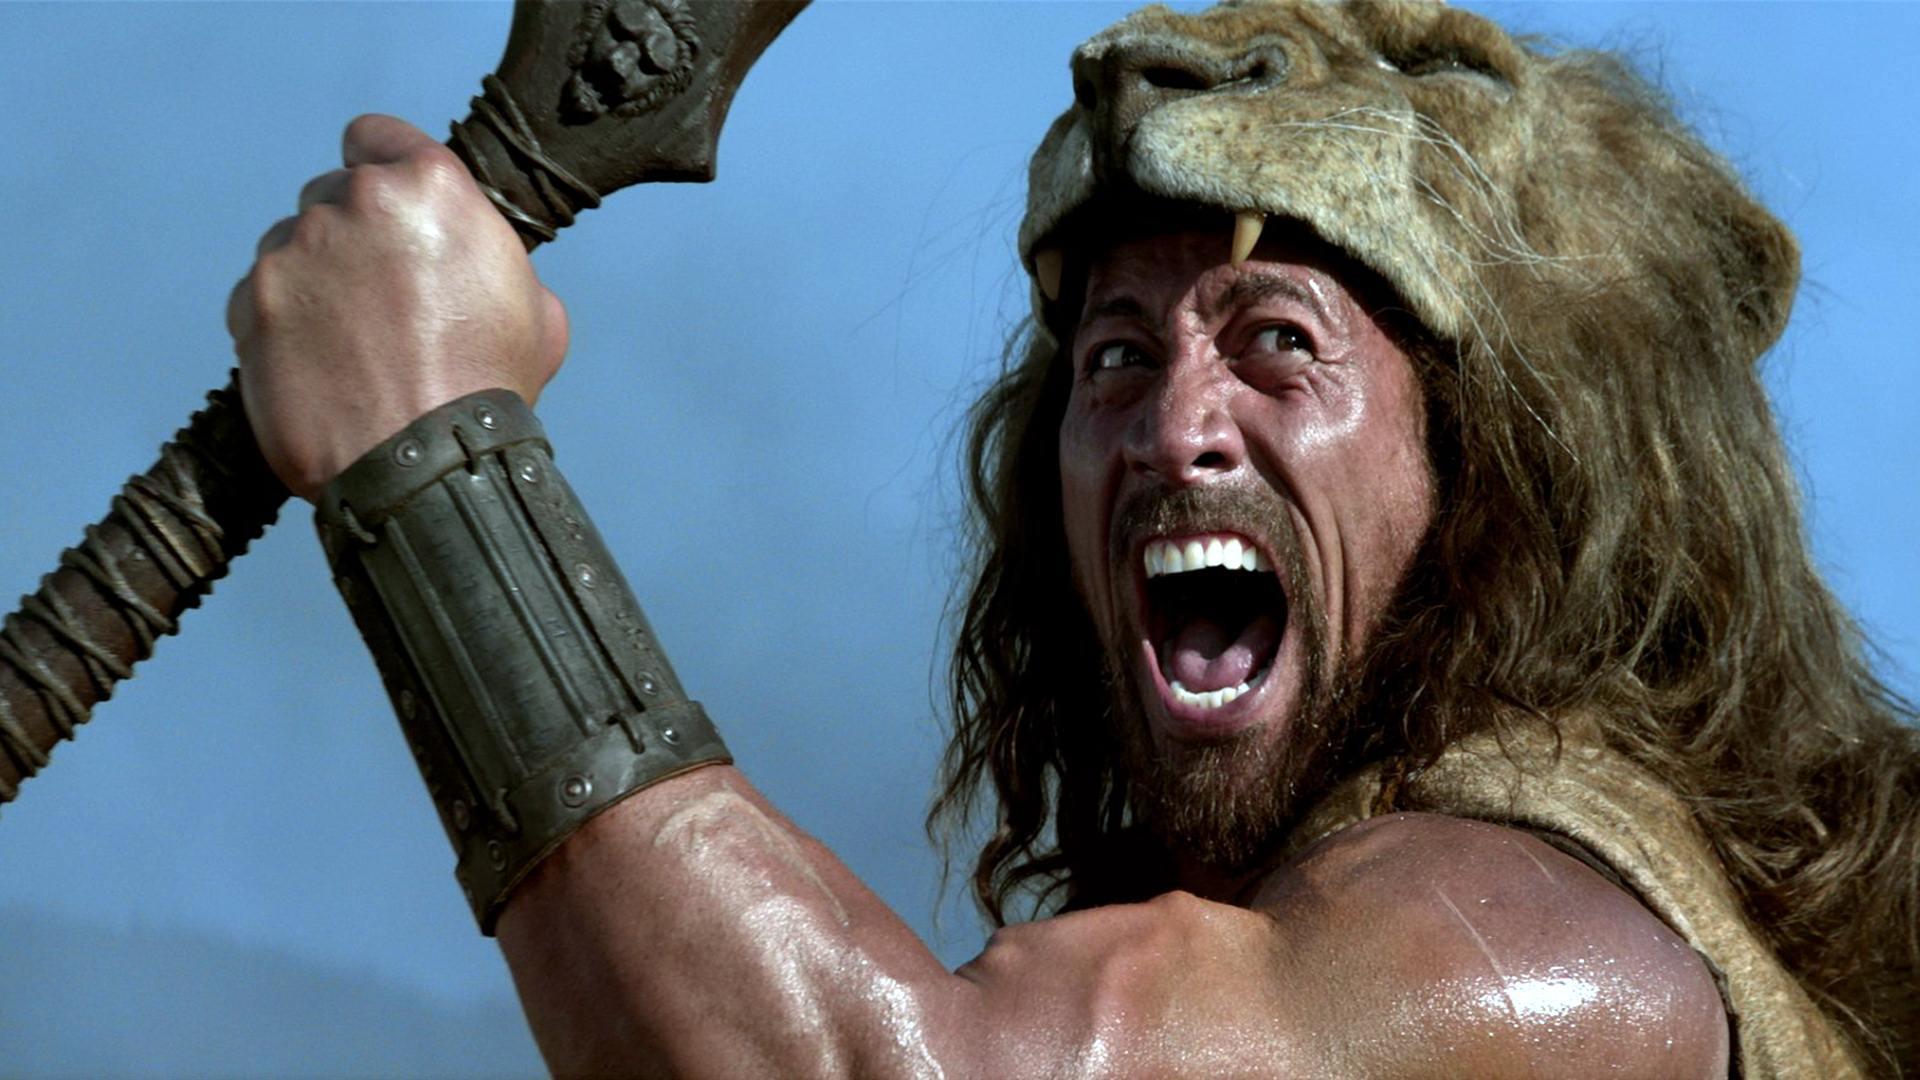 Hercules Wallpaper - 001 - Movie Smack Talk Wallpaper